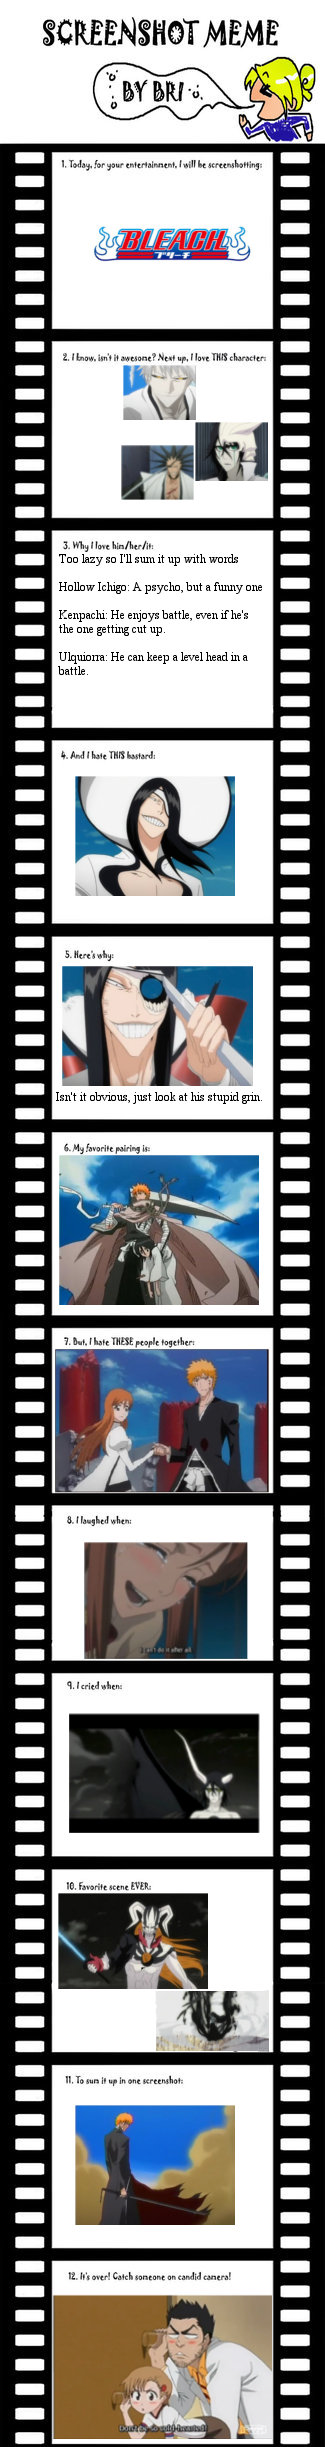 Bleach screenshot meme by Ilackskill